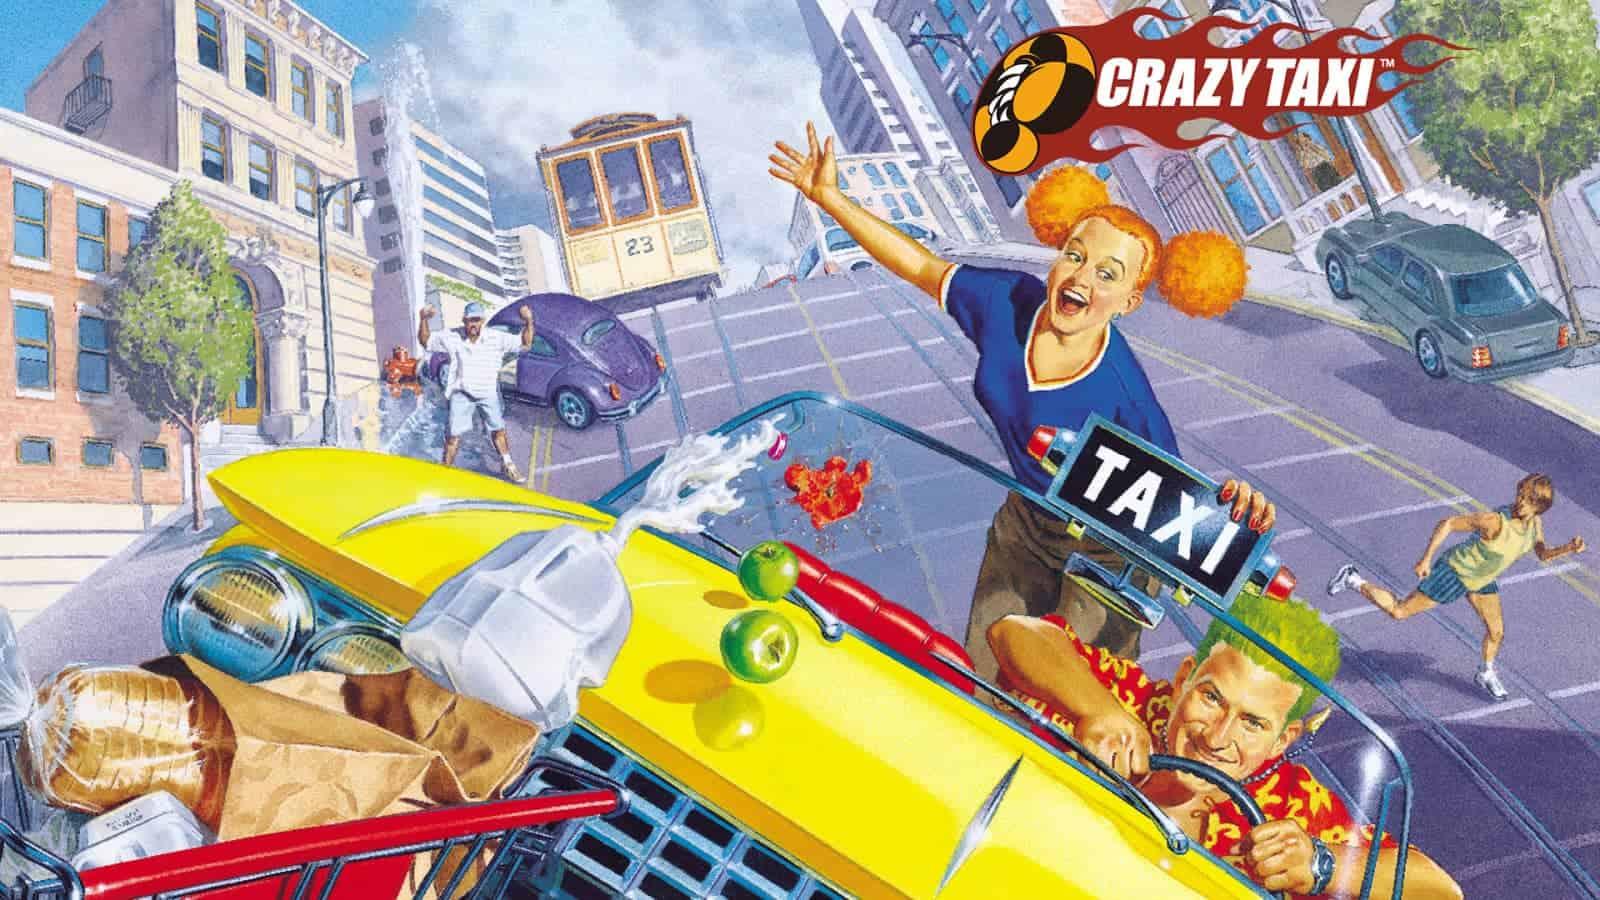 SEGA Has A Crazy Idea, To Revive The Crazy Taxi Franchise